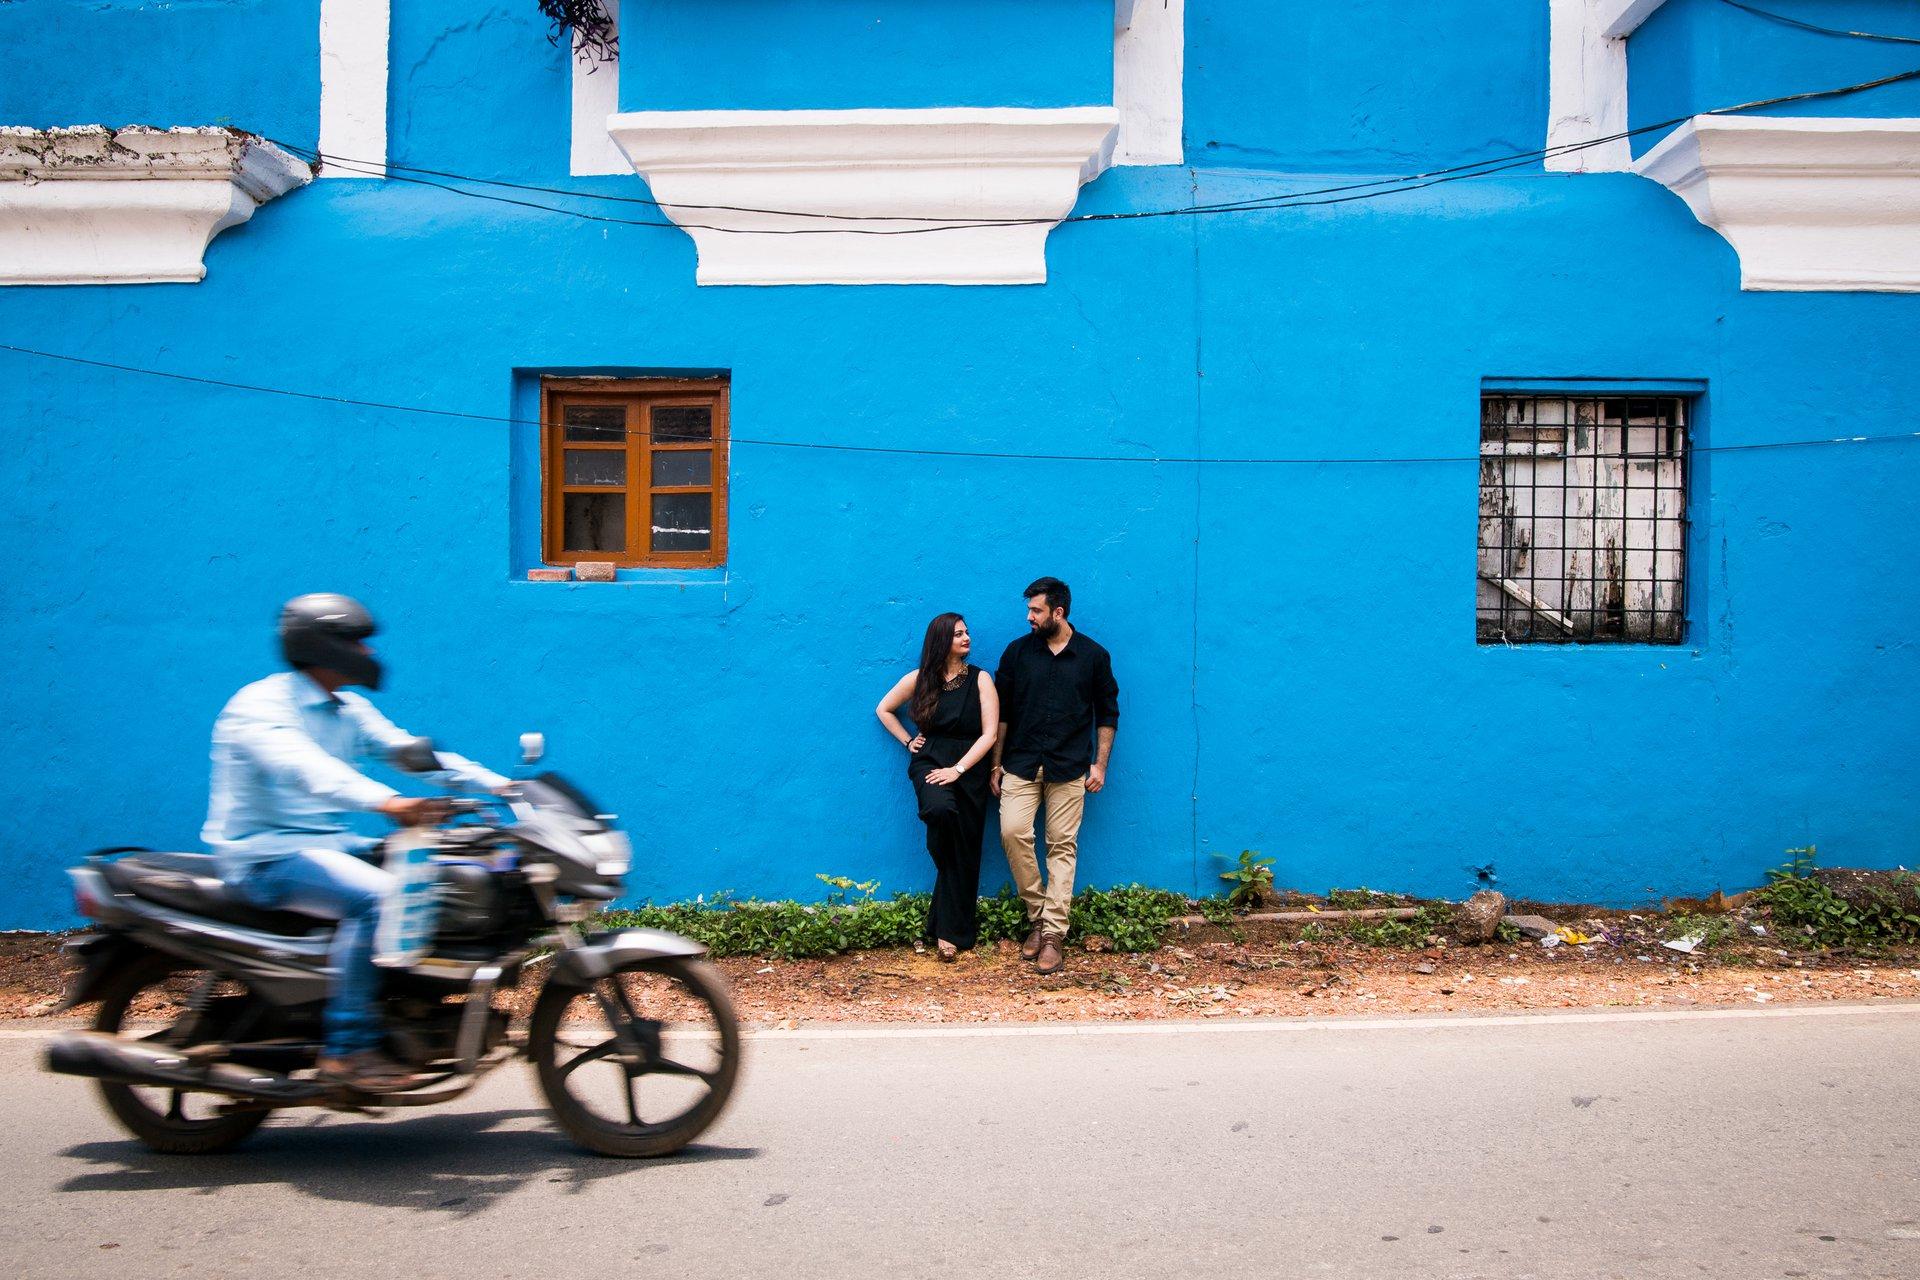 Shweta and Soumak's Portfolio - Image 6